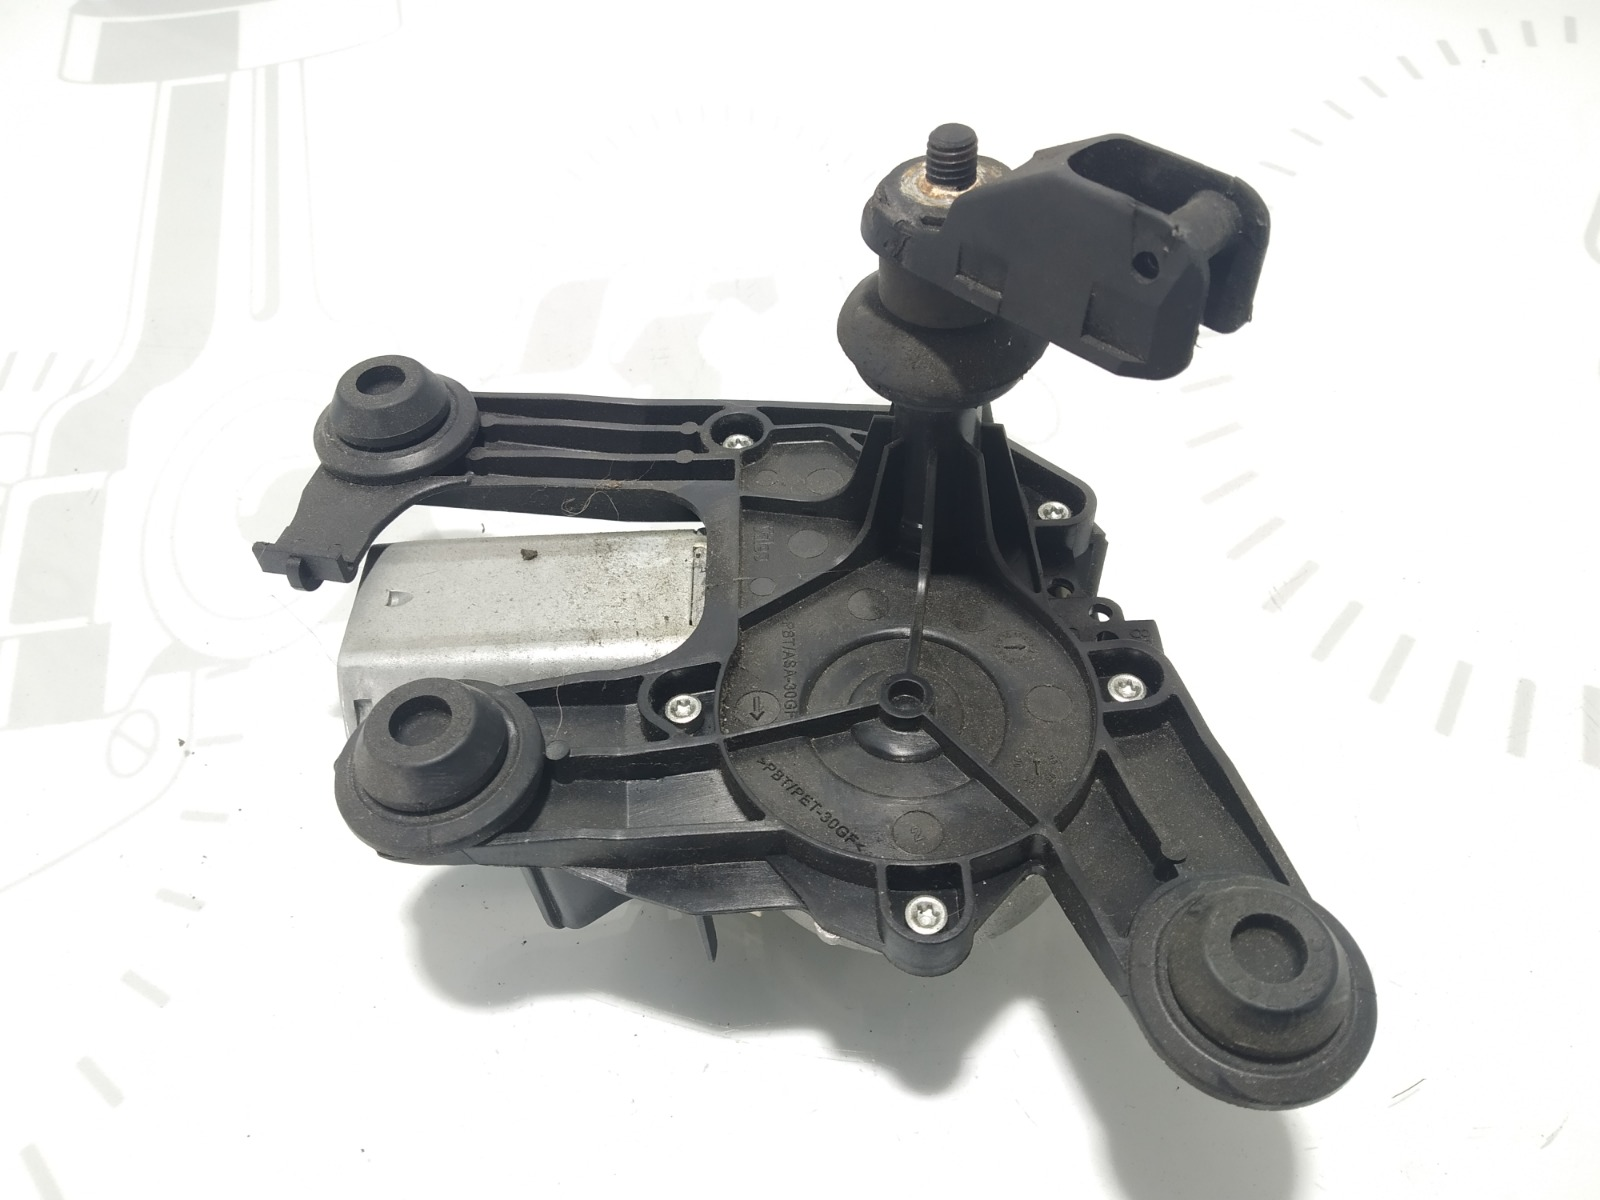 Моторчик заднего стеклоочистителя (дворника) Peugeot 308 T7 1.6 HDI 2009 (б/у)